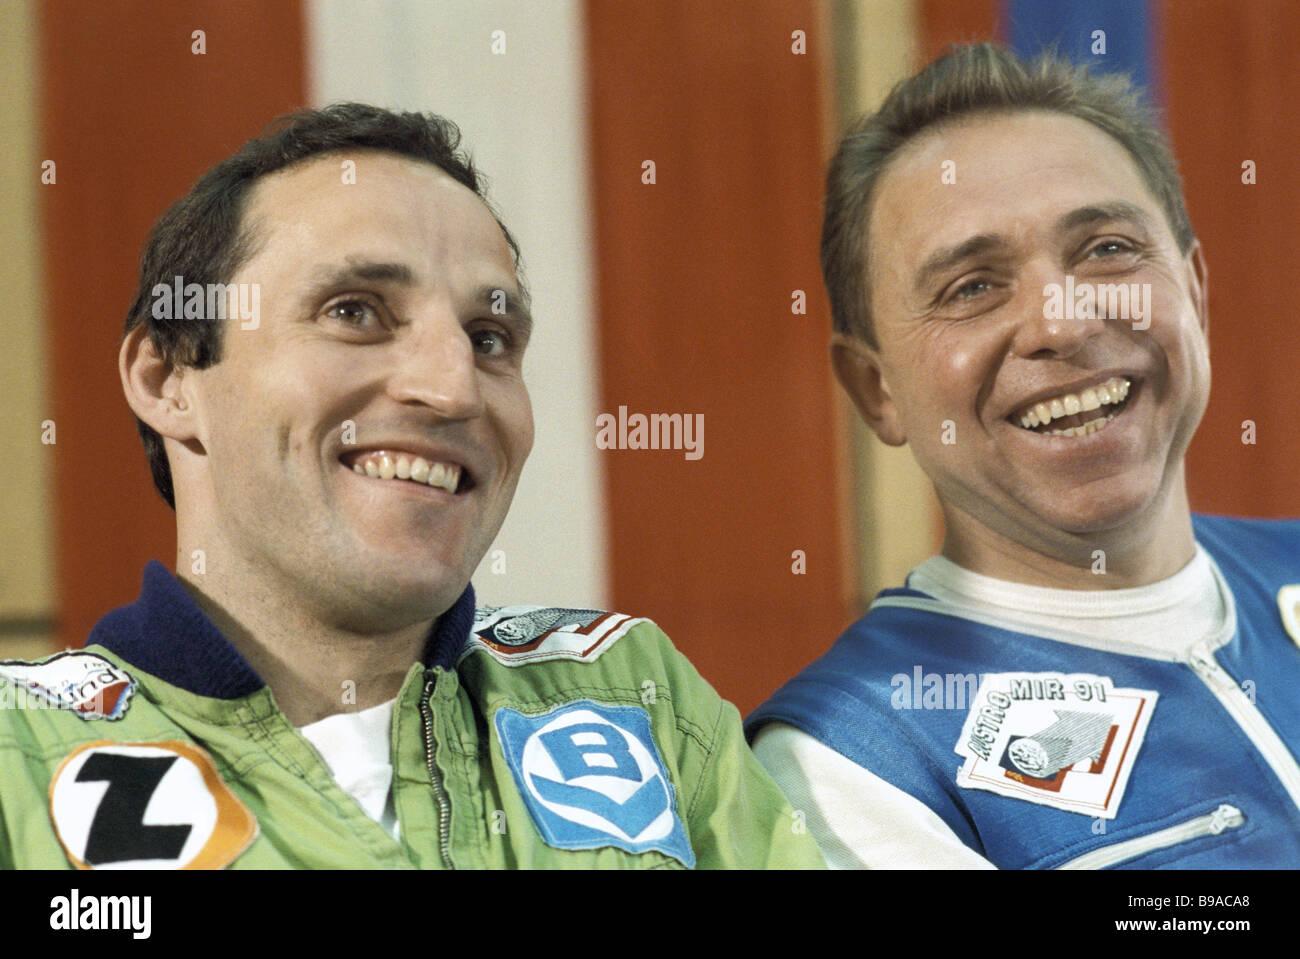 Soyuz TM 13 spacecraft crew Austrian astronaut Franz Viehboeck left and Hero of the Soviet Union Alexander Volkov - Stock Image